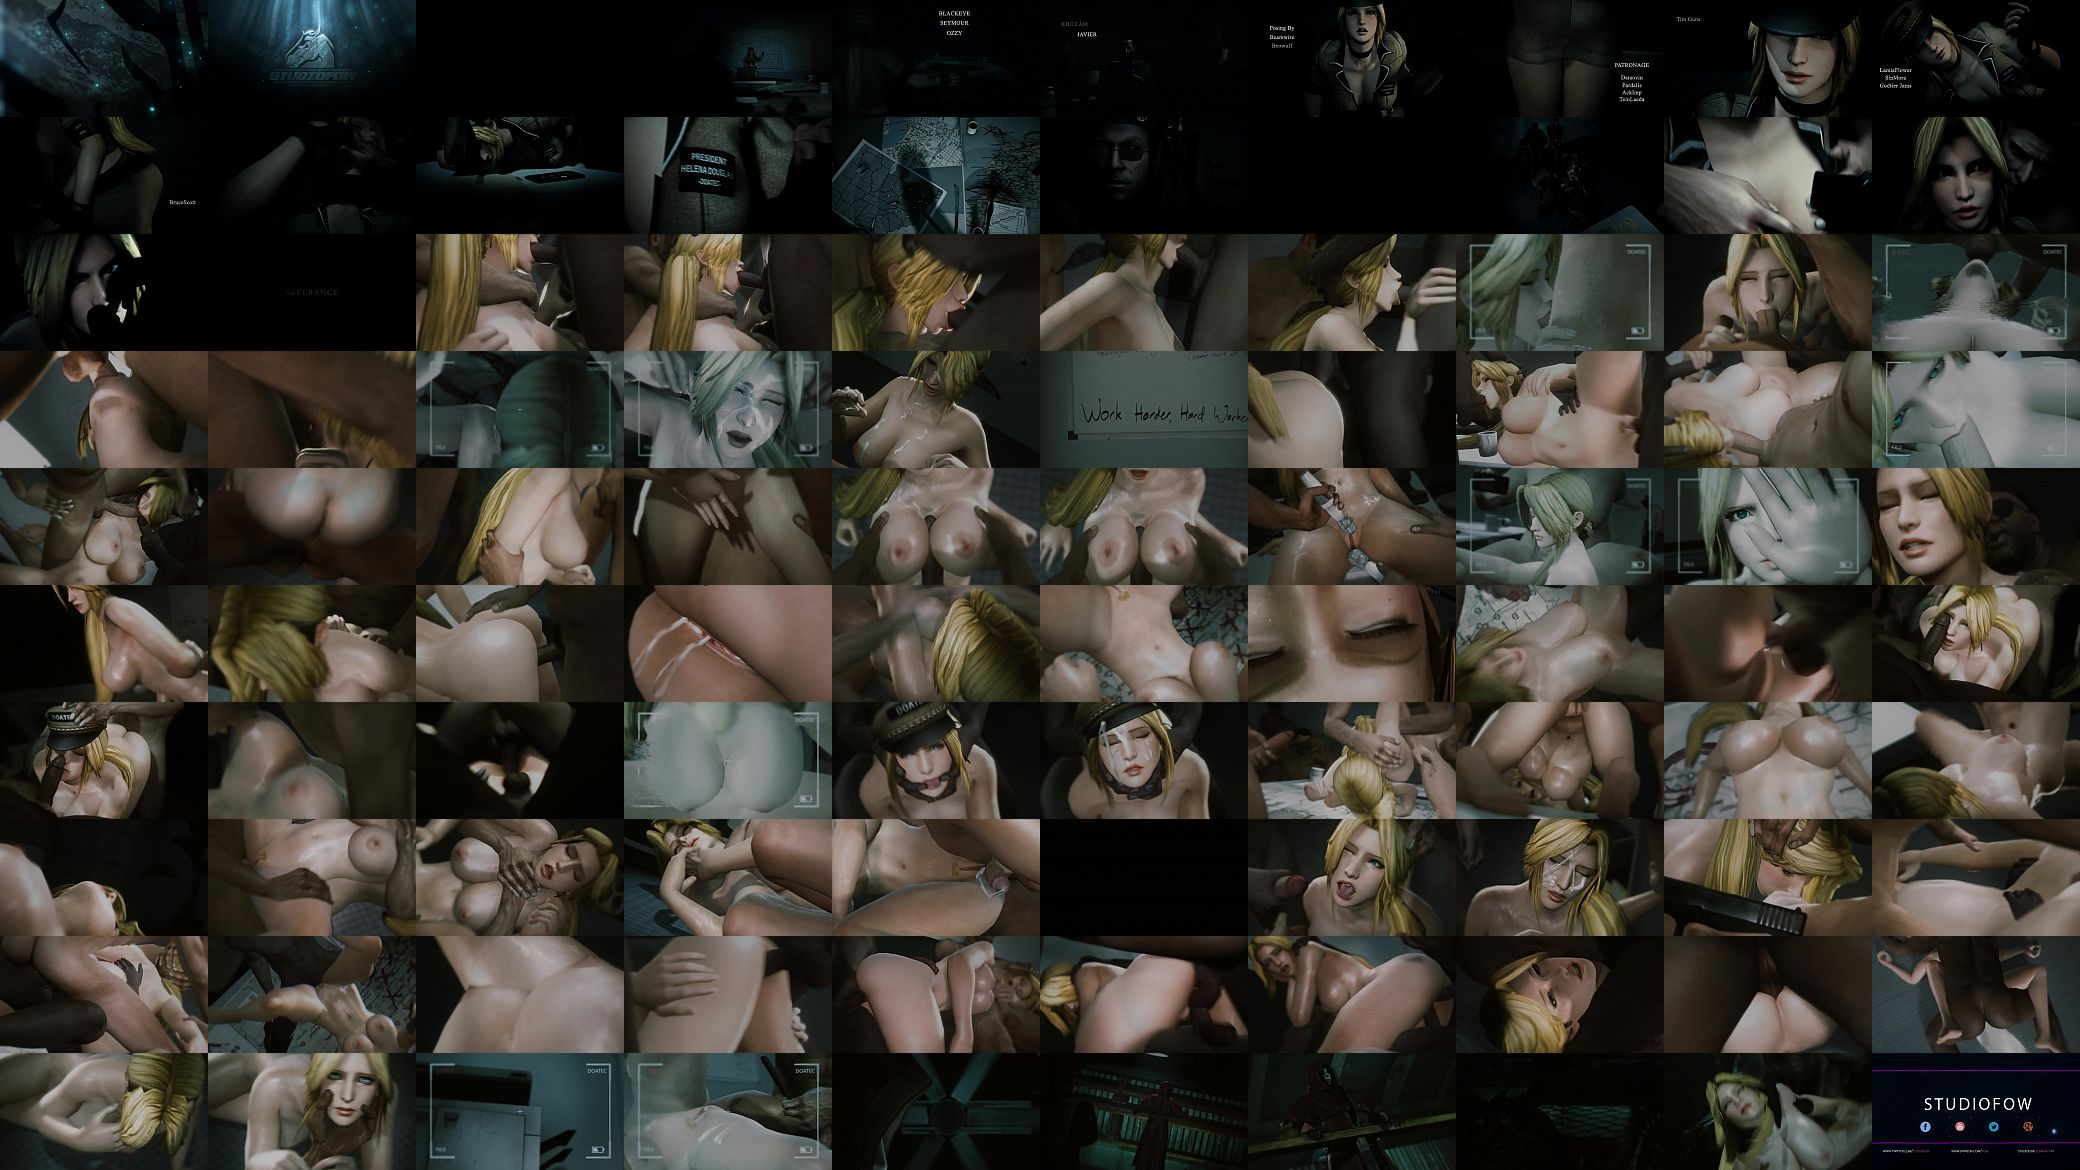 3D Porn Studiofow Men fow-014] severance - xnxx